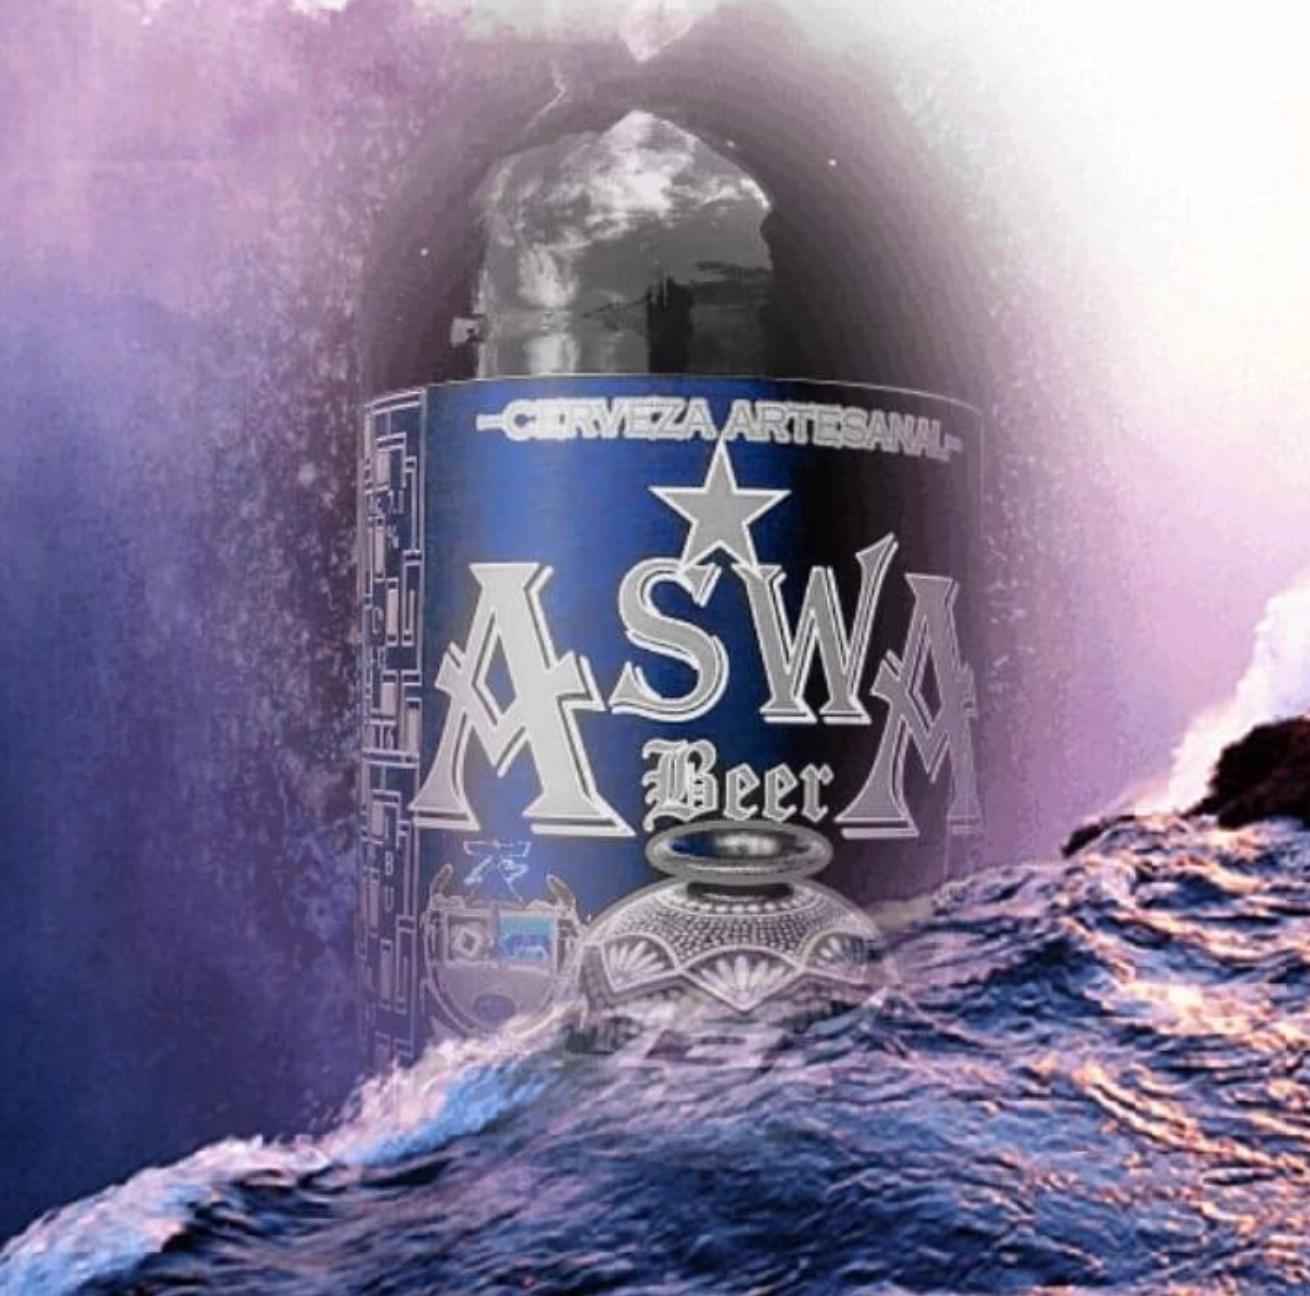 CERVEZA ARTESANAL ASWA BEER  @facebook